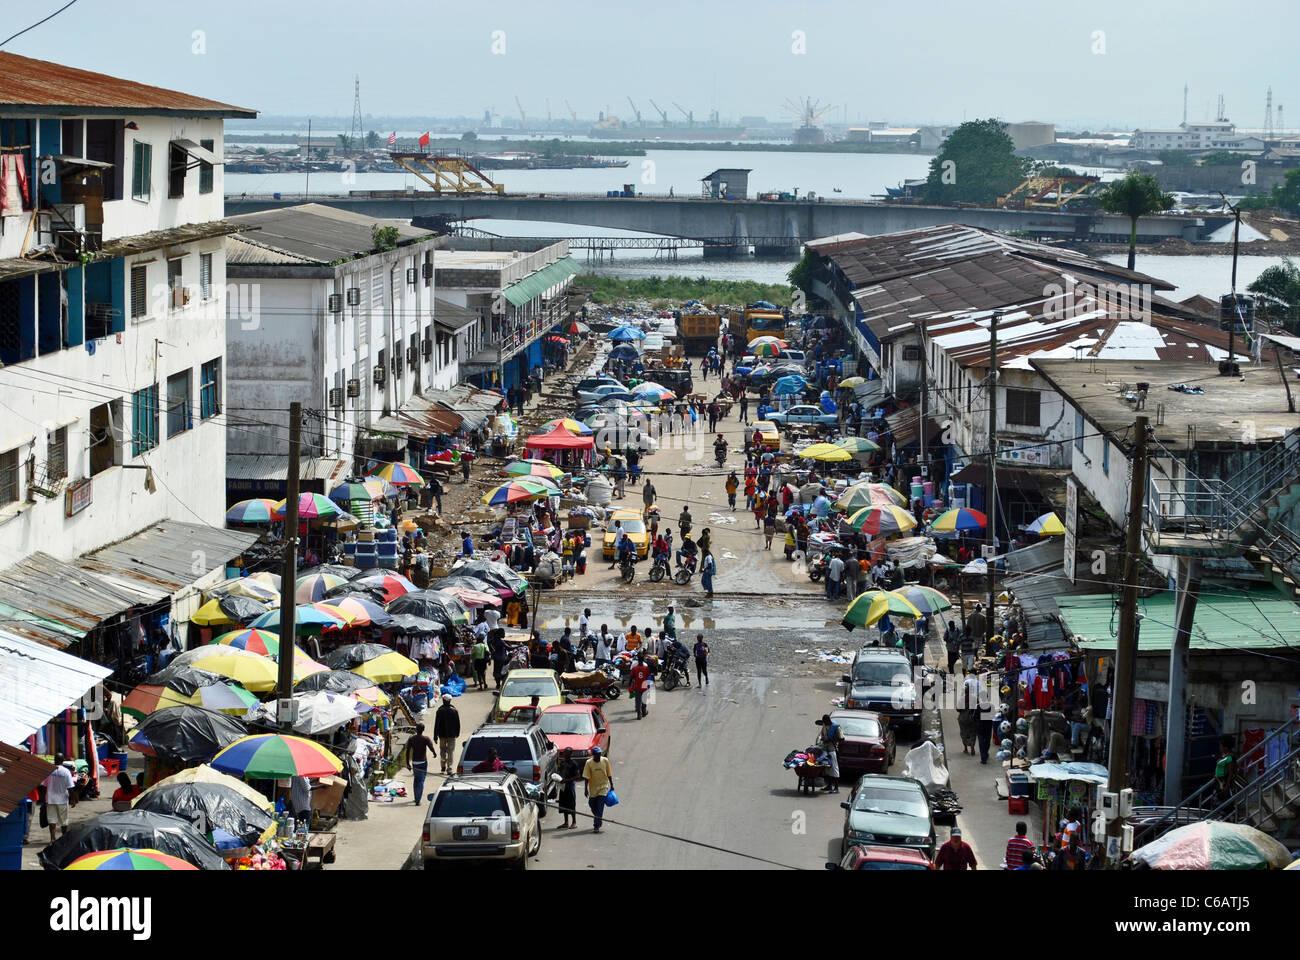 Downtown Monrovia, Liberia - Stock Image